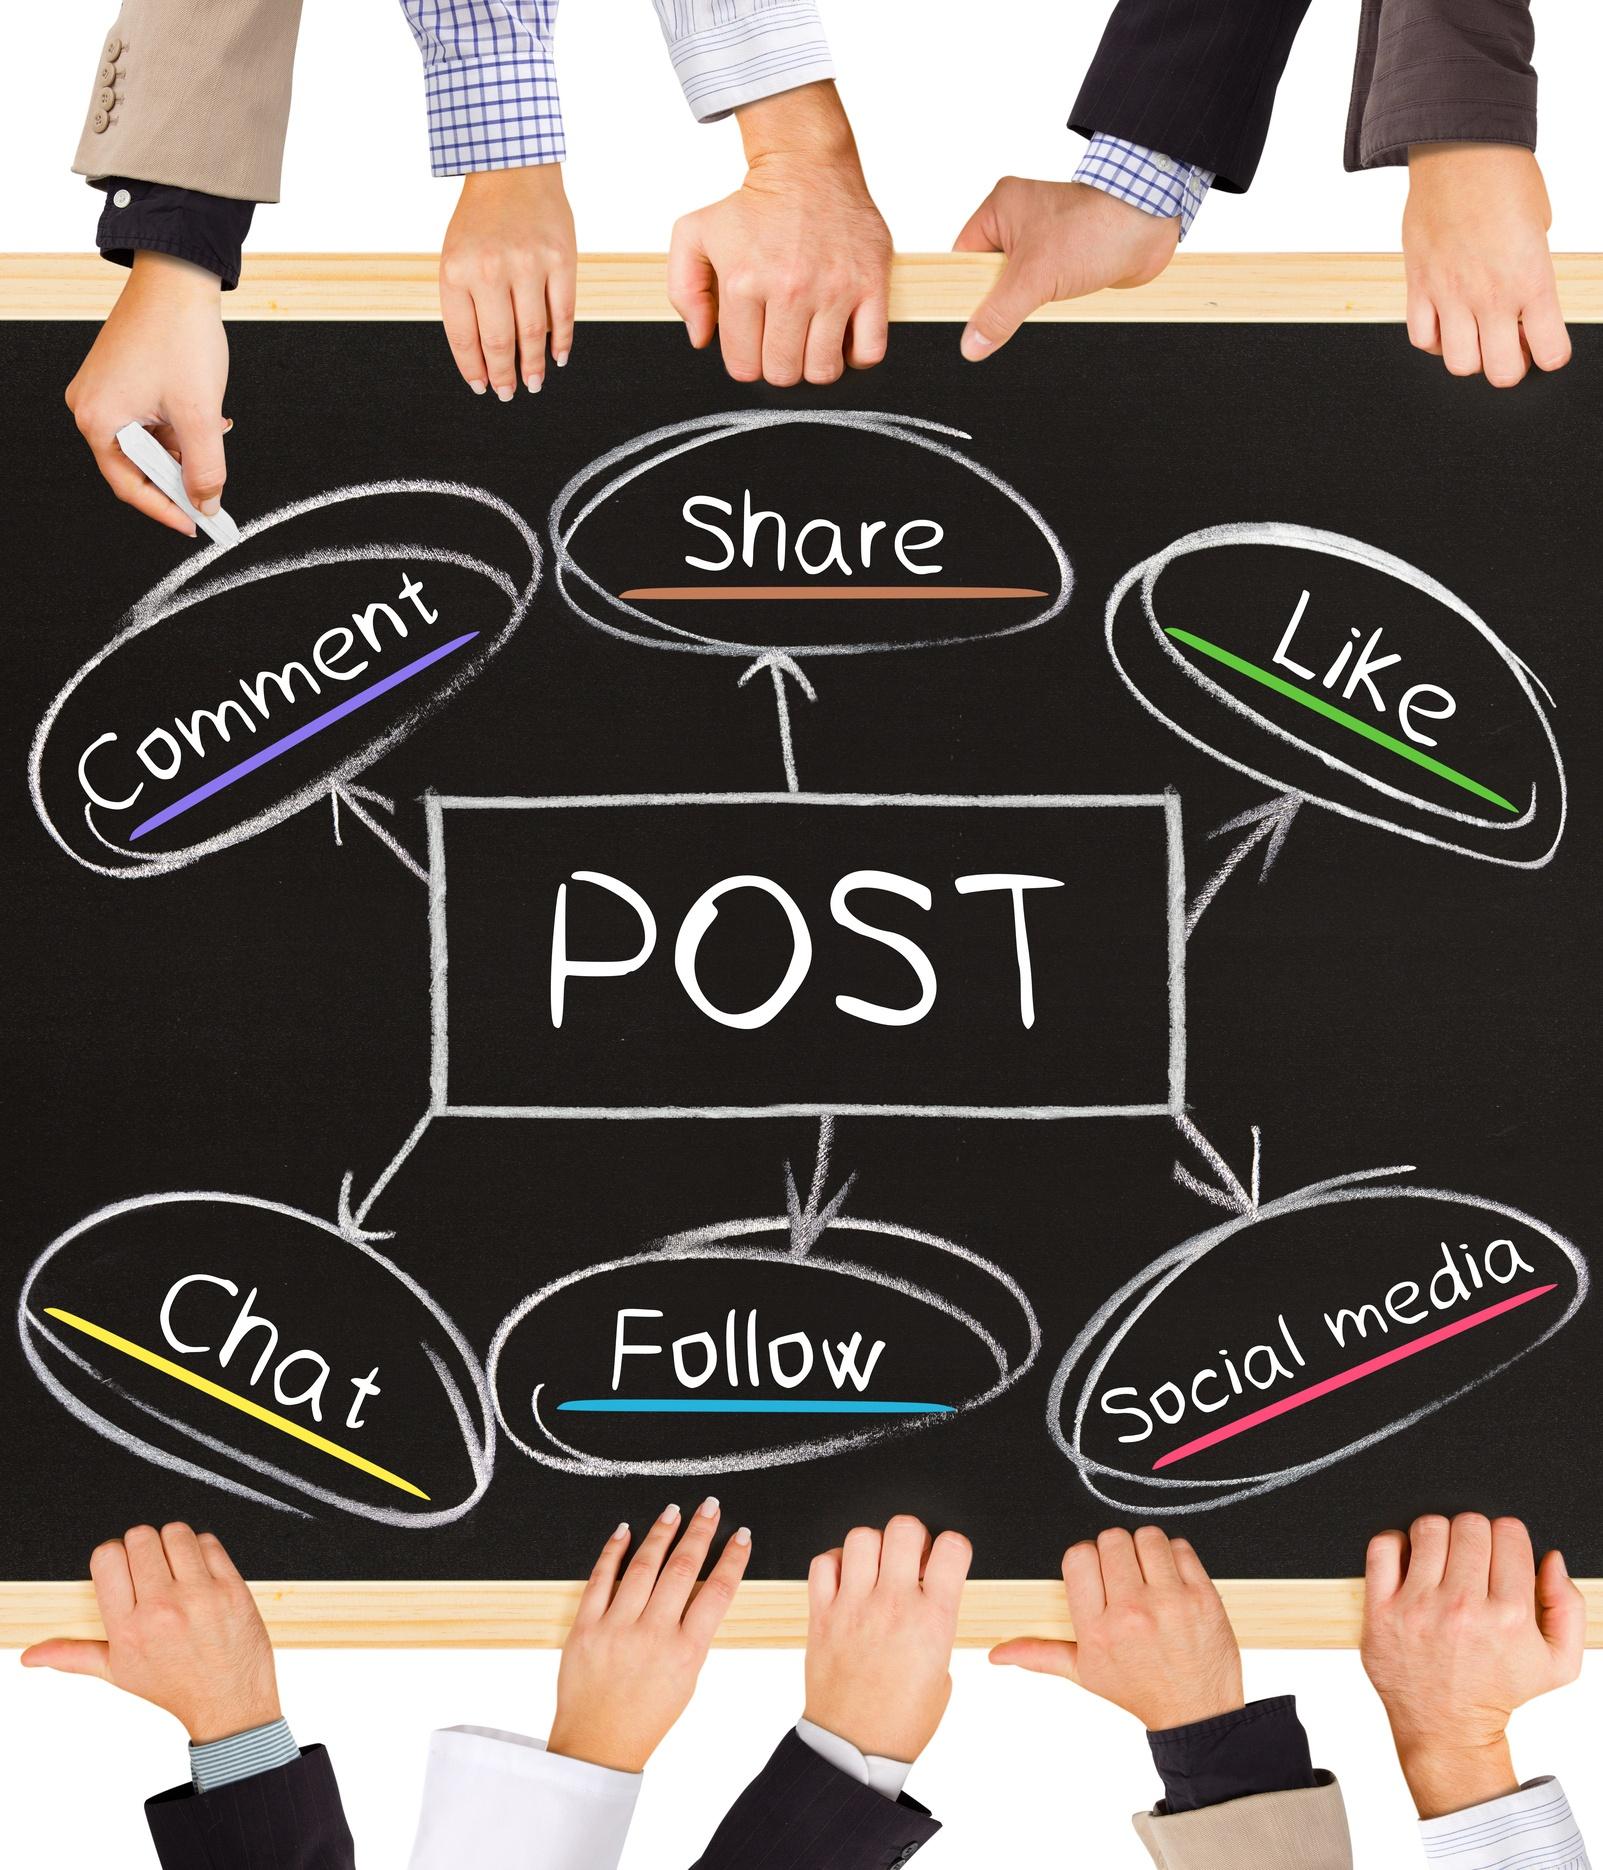 http://cdn2.hubspot.net/hubfs/497826/social-media-content-plan.jpg